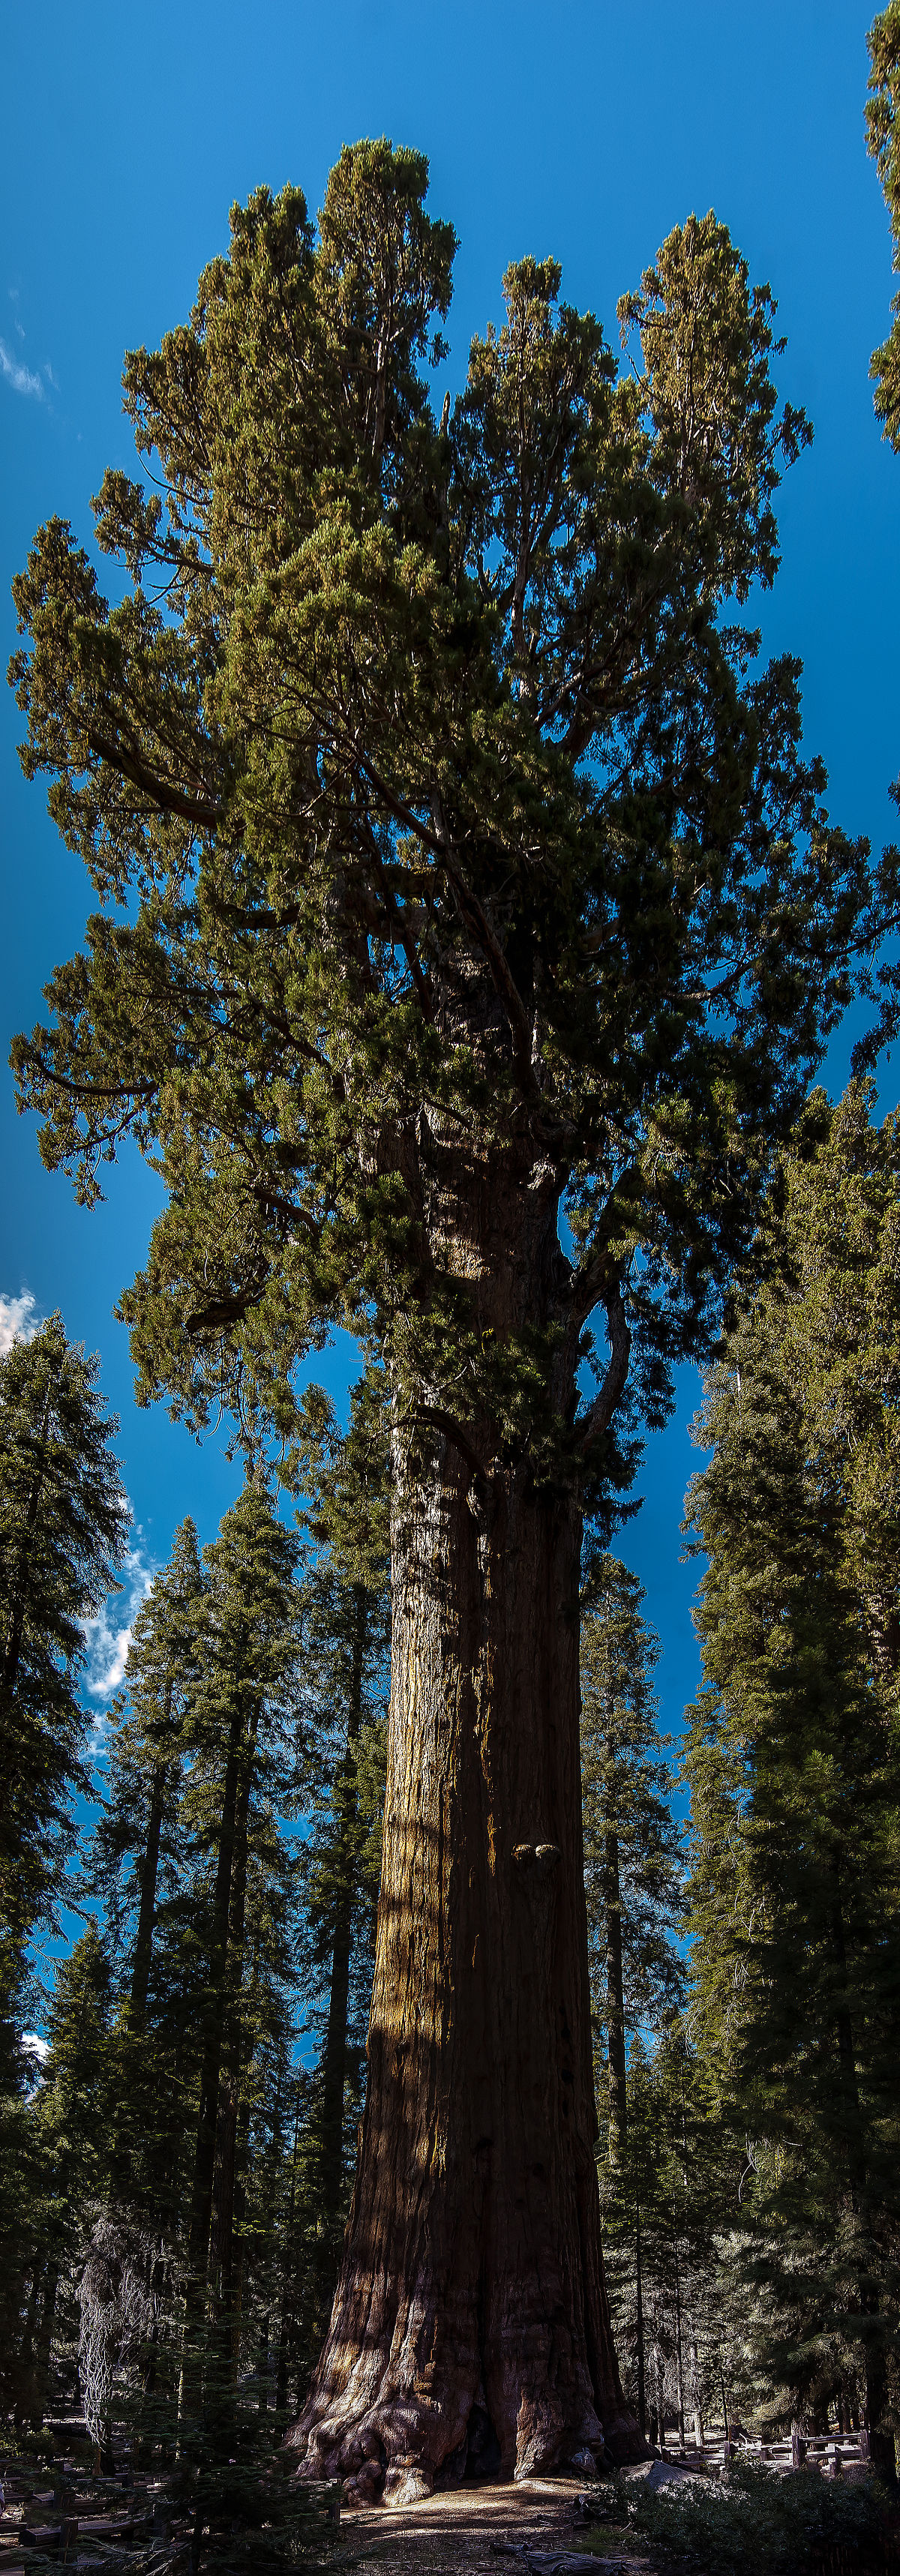 United States - California - Sequoia National Park - General Sherman Tree - Panorama.jpg